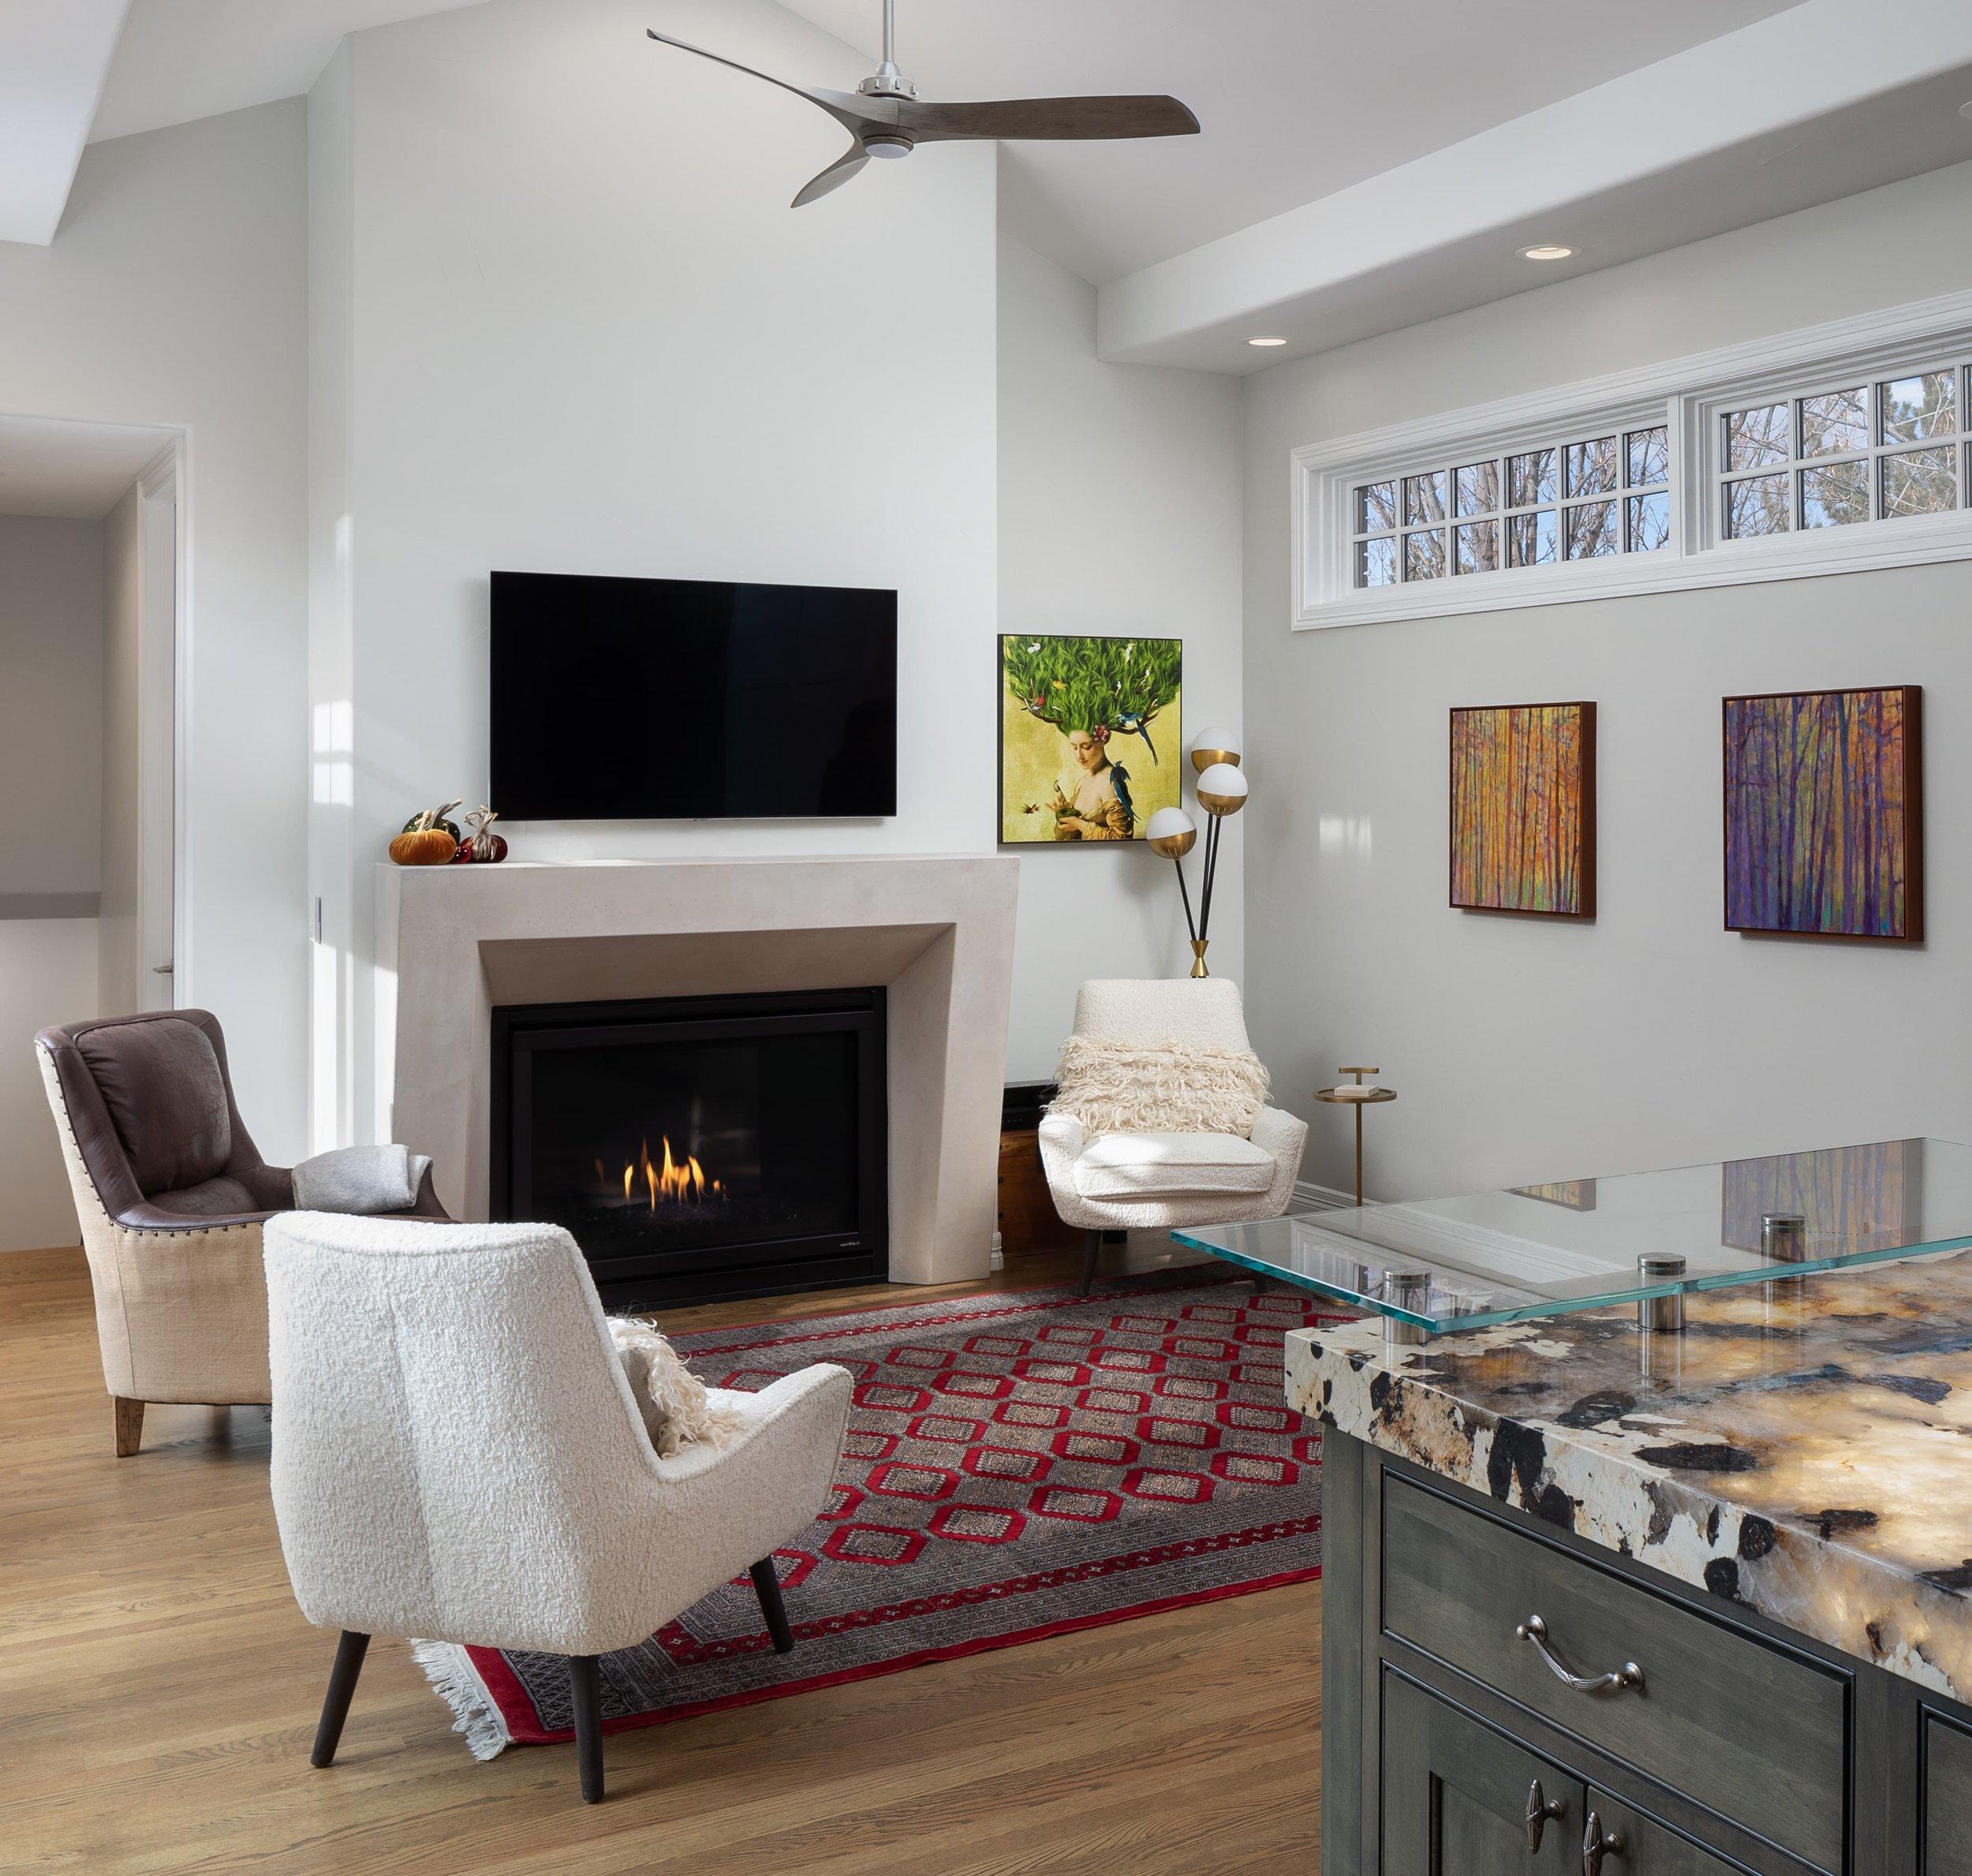 20180123_studio design_monroe house_living room_photo by timothy gormley_www.tgimage.com_06.jpg